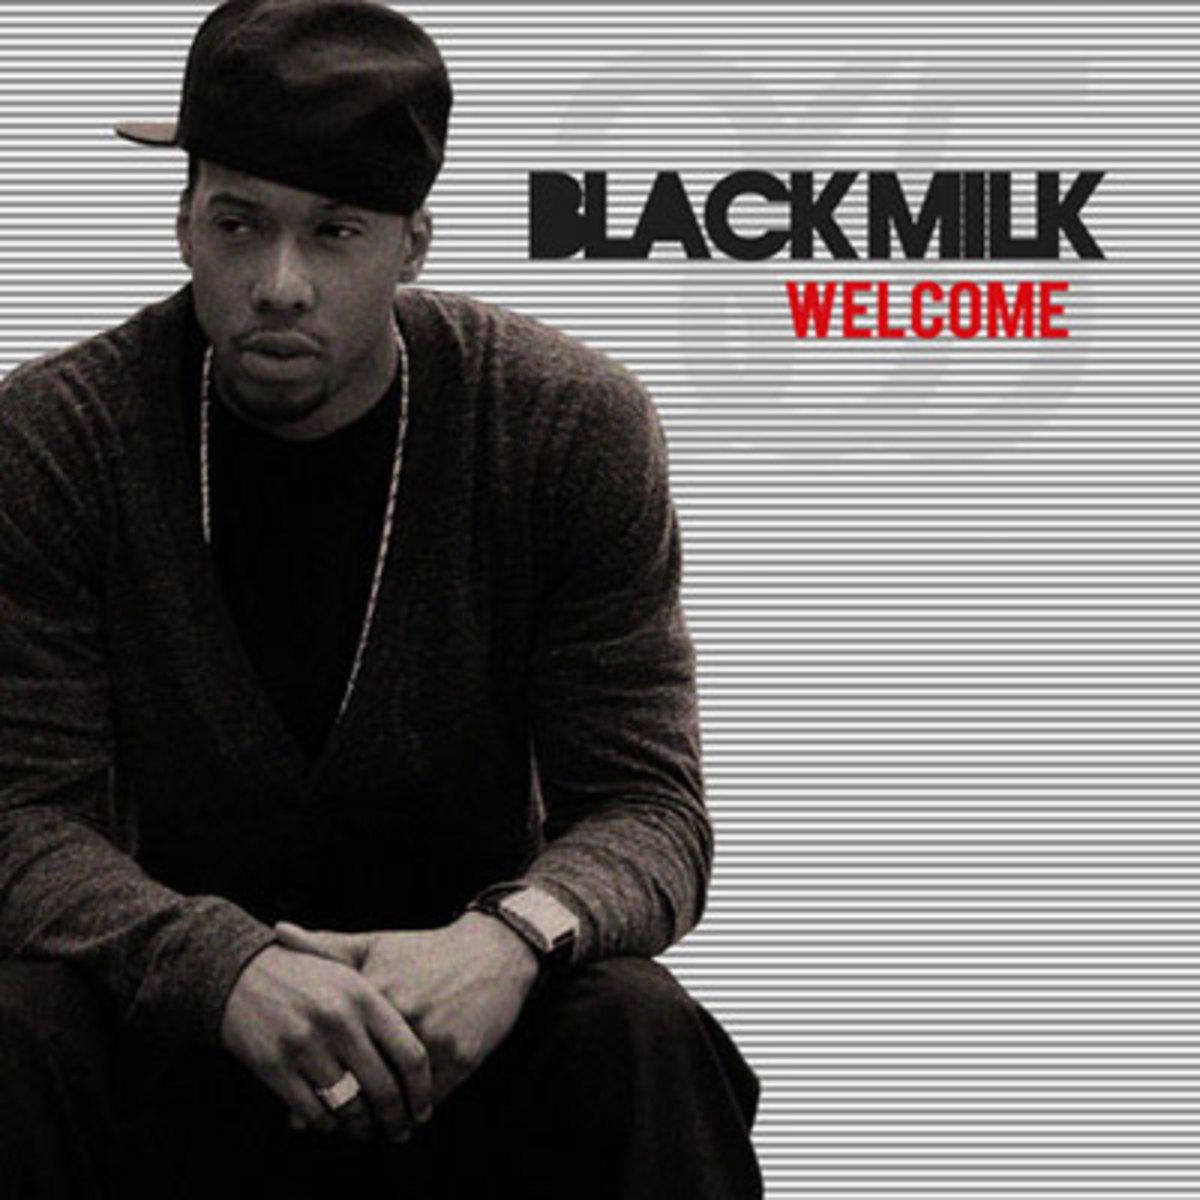 blackmilk-welcome.jpg